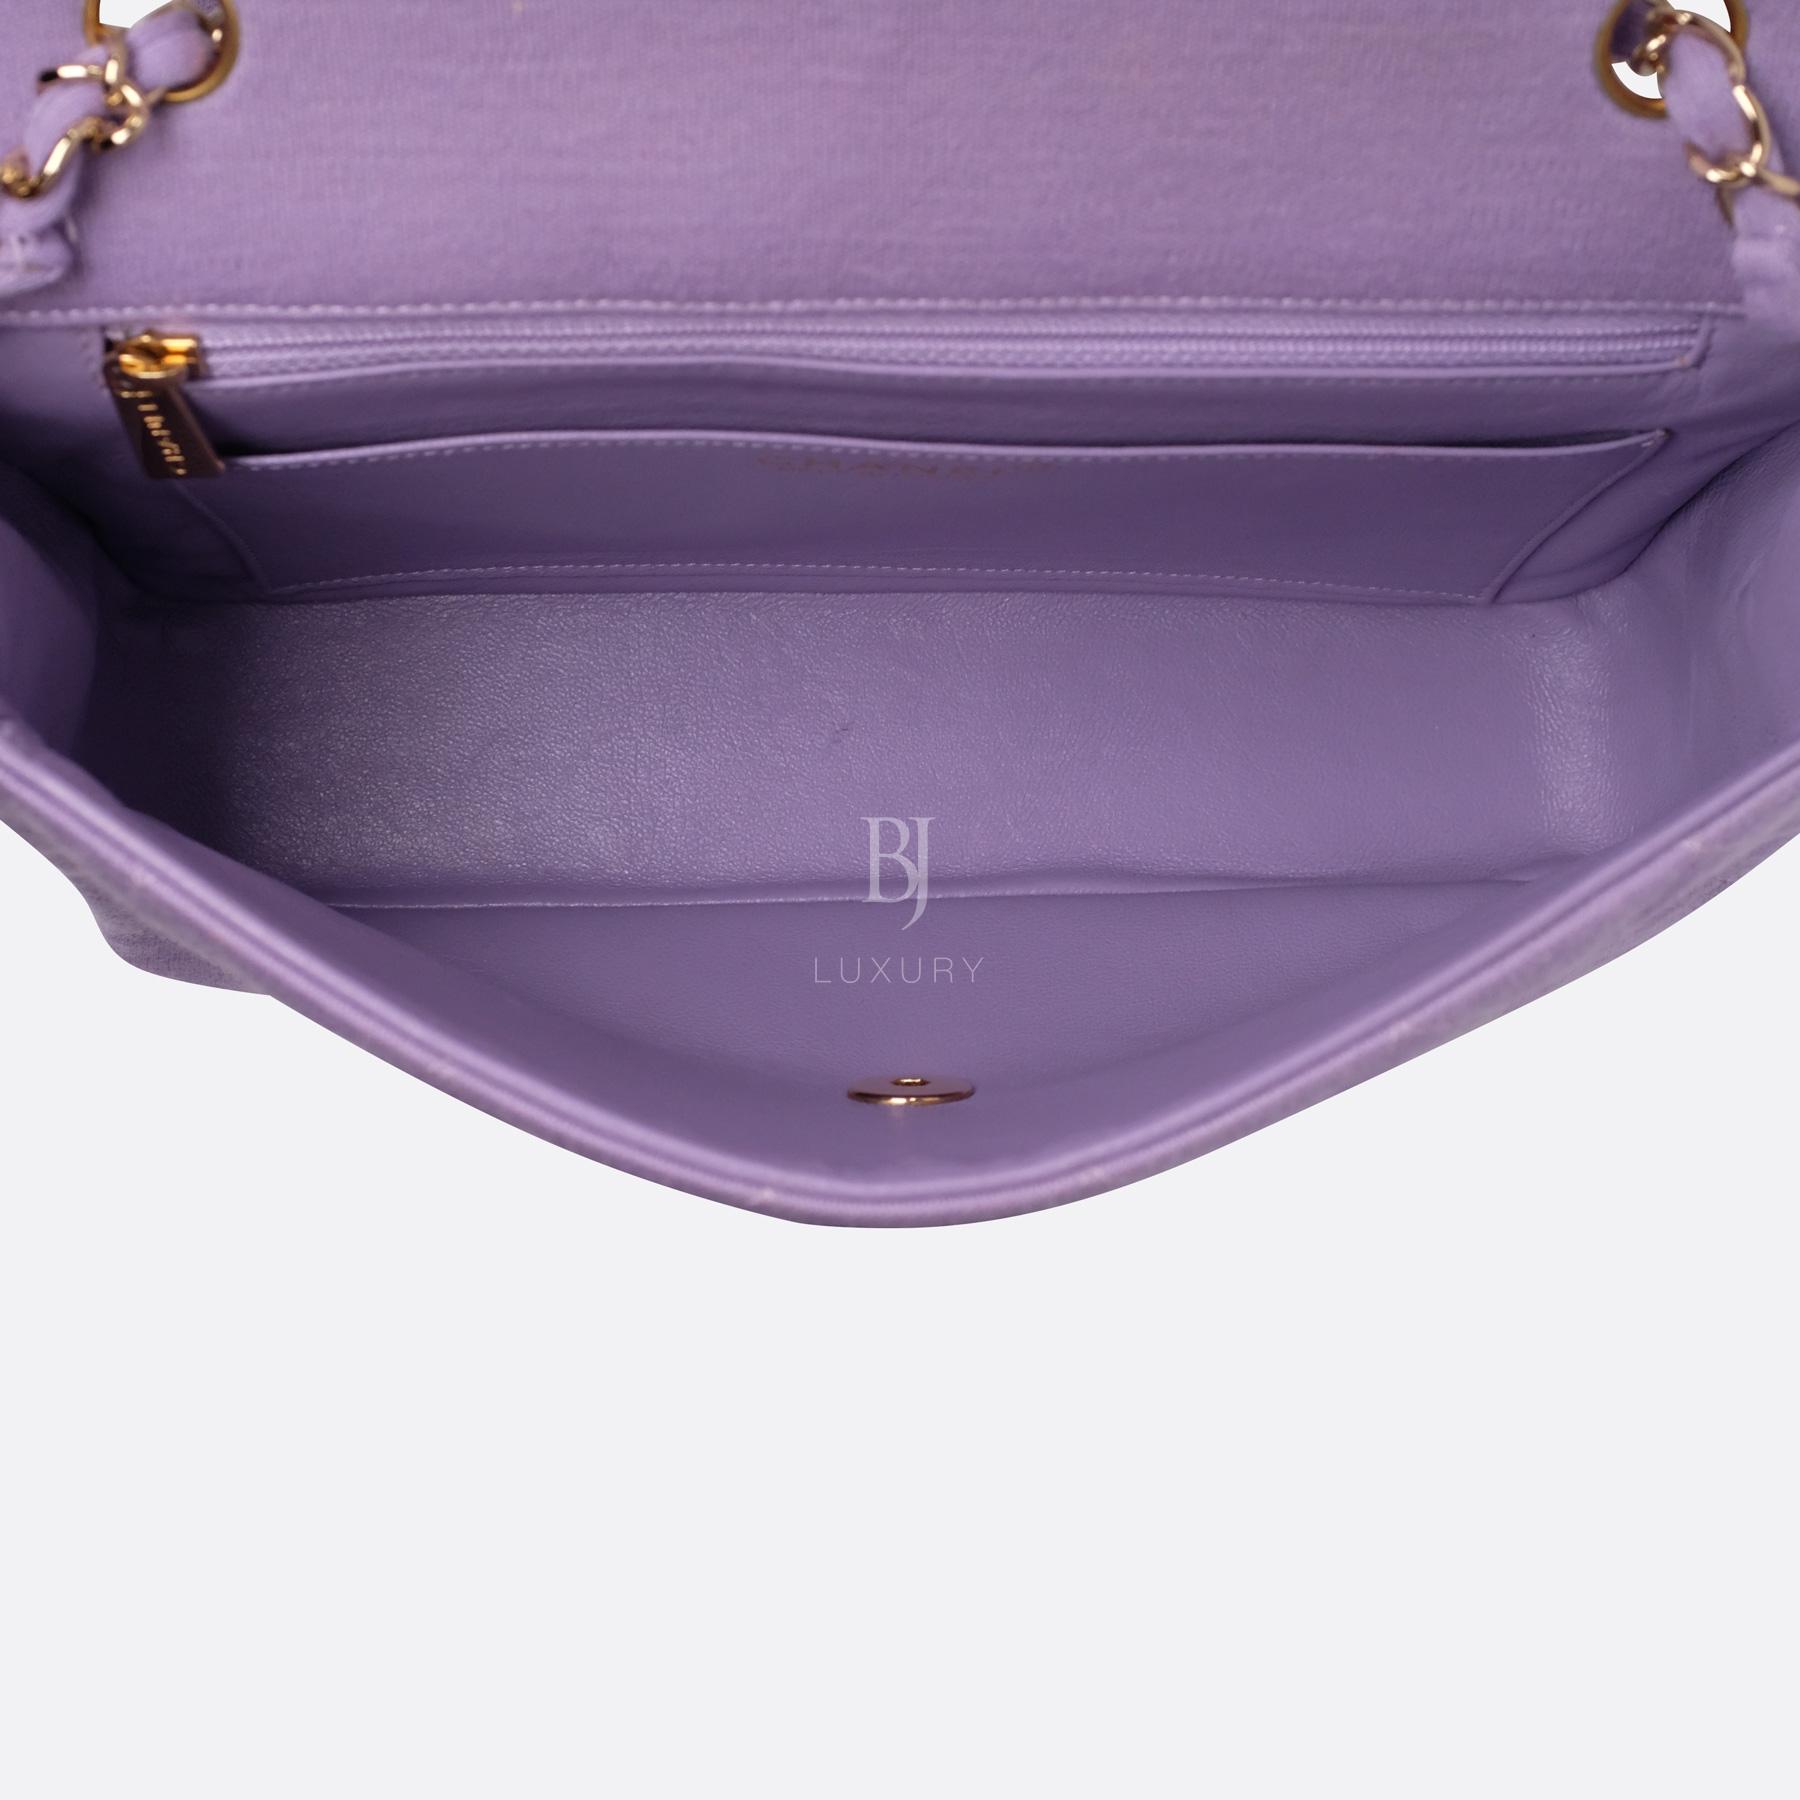 Chanel Flap Bag Medium Jersey Gold Lilac BJ Luxury 17.jpg